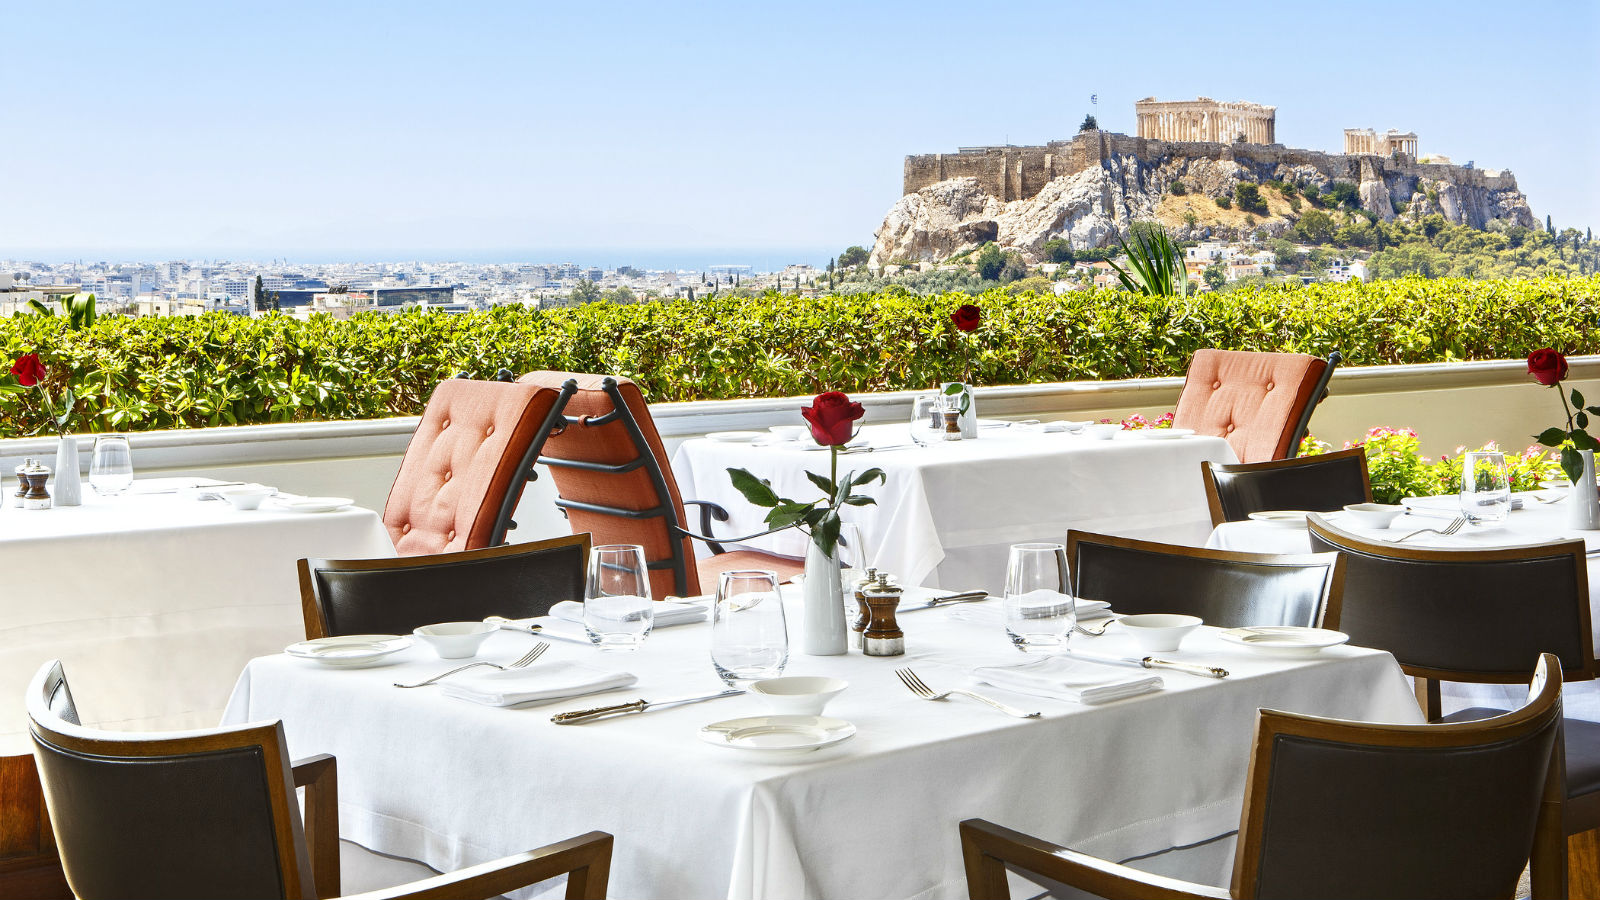 GB Roof Garden Restaurant - Lunch-Med